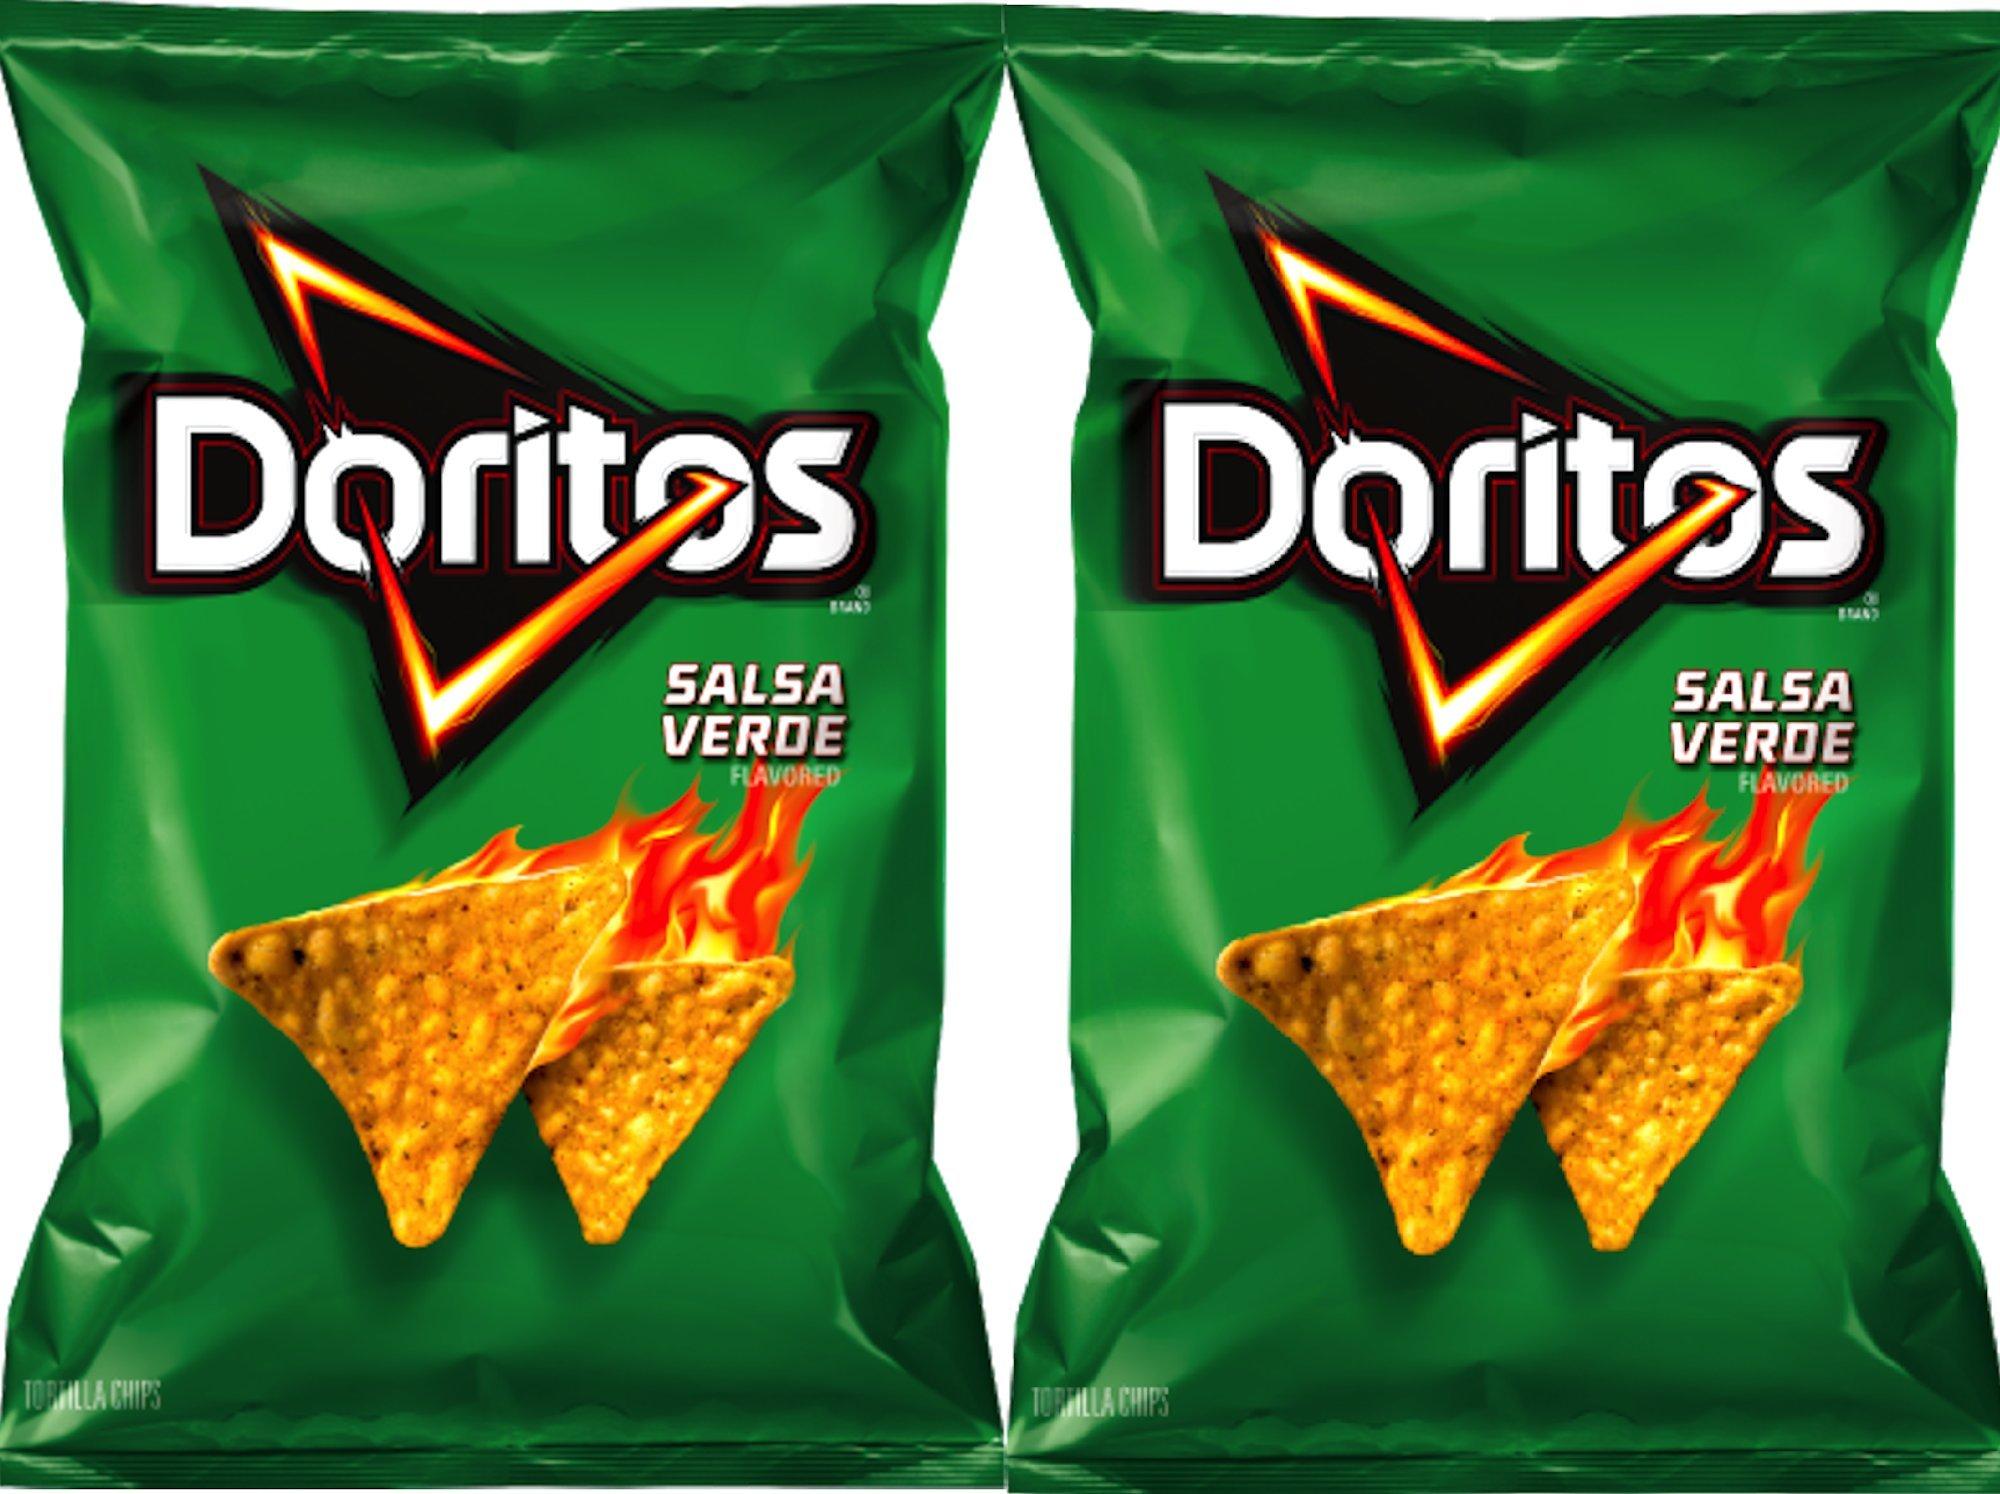 Doritos Salsa verde Flavored Tortilla Chips 10 oz Bags (2) by Doritos